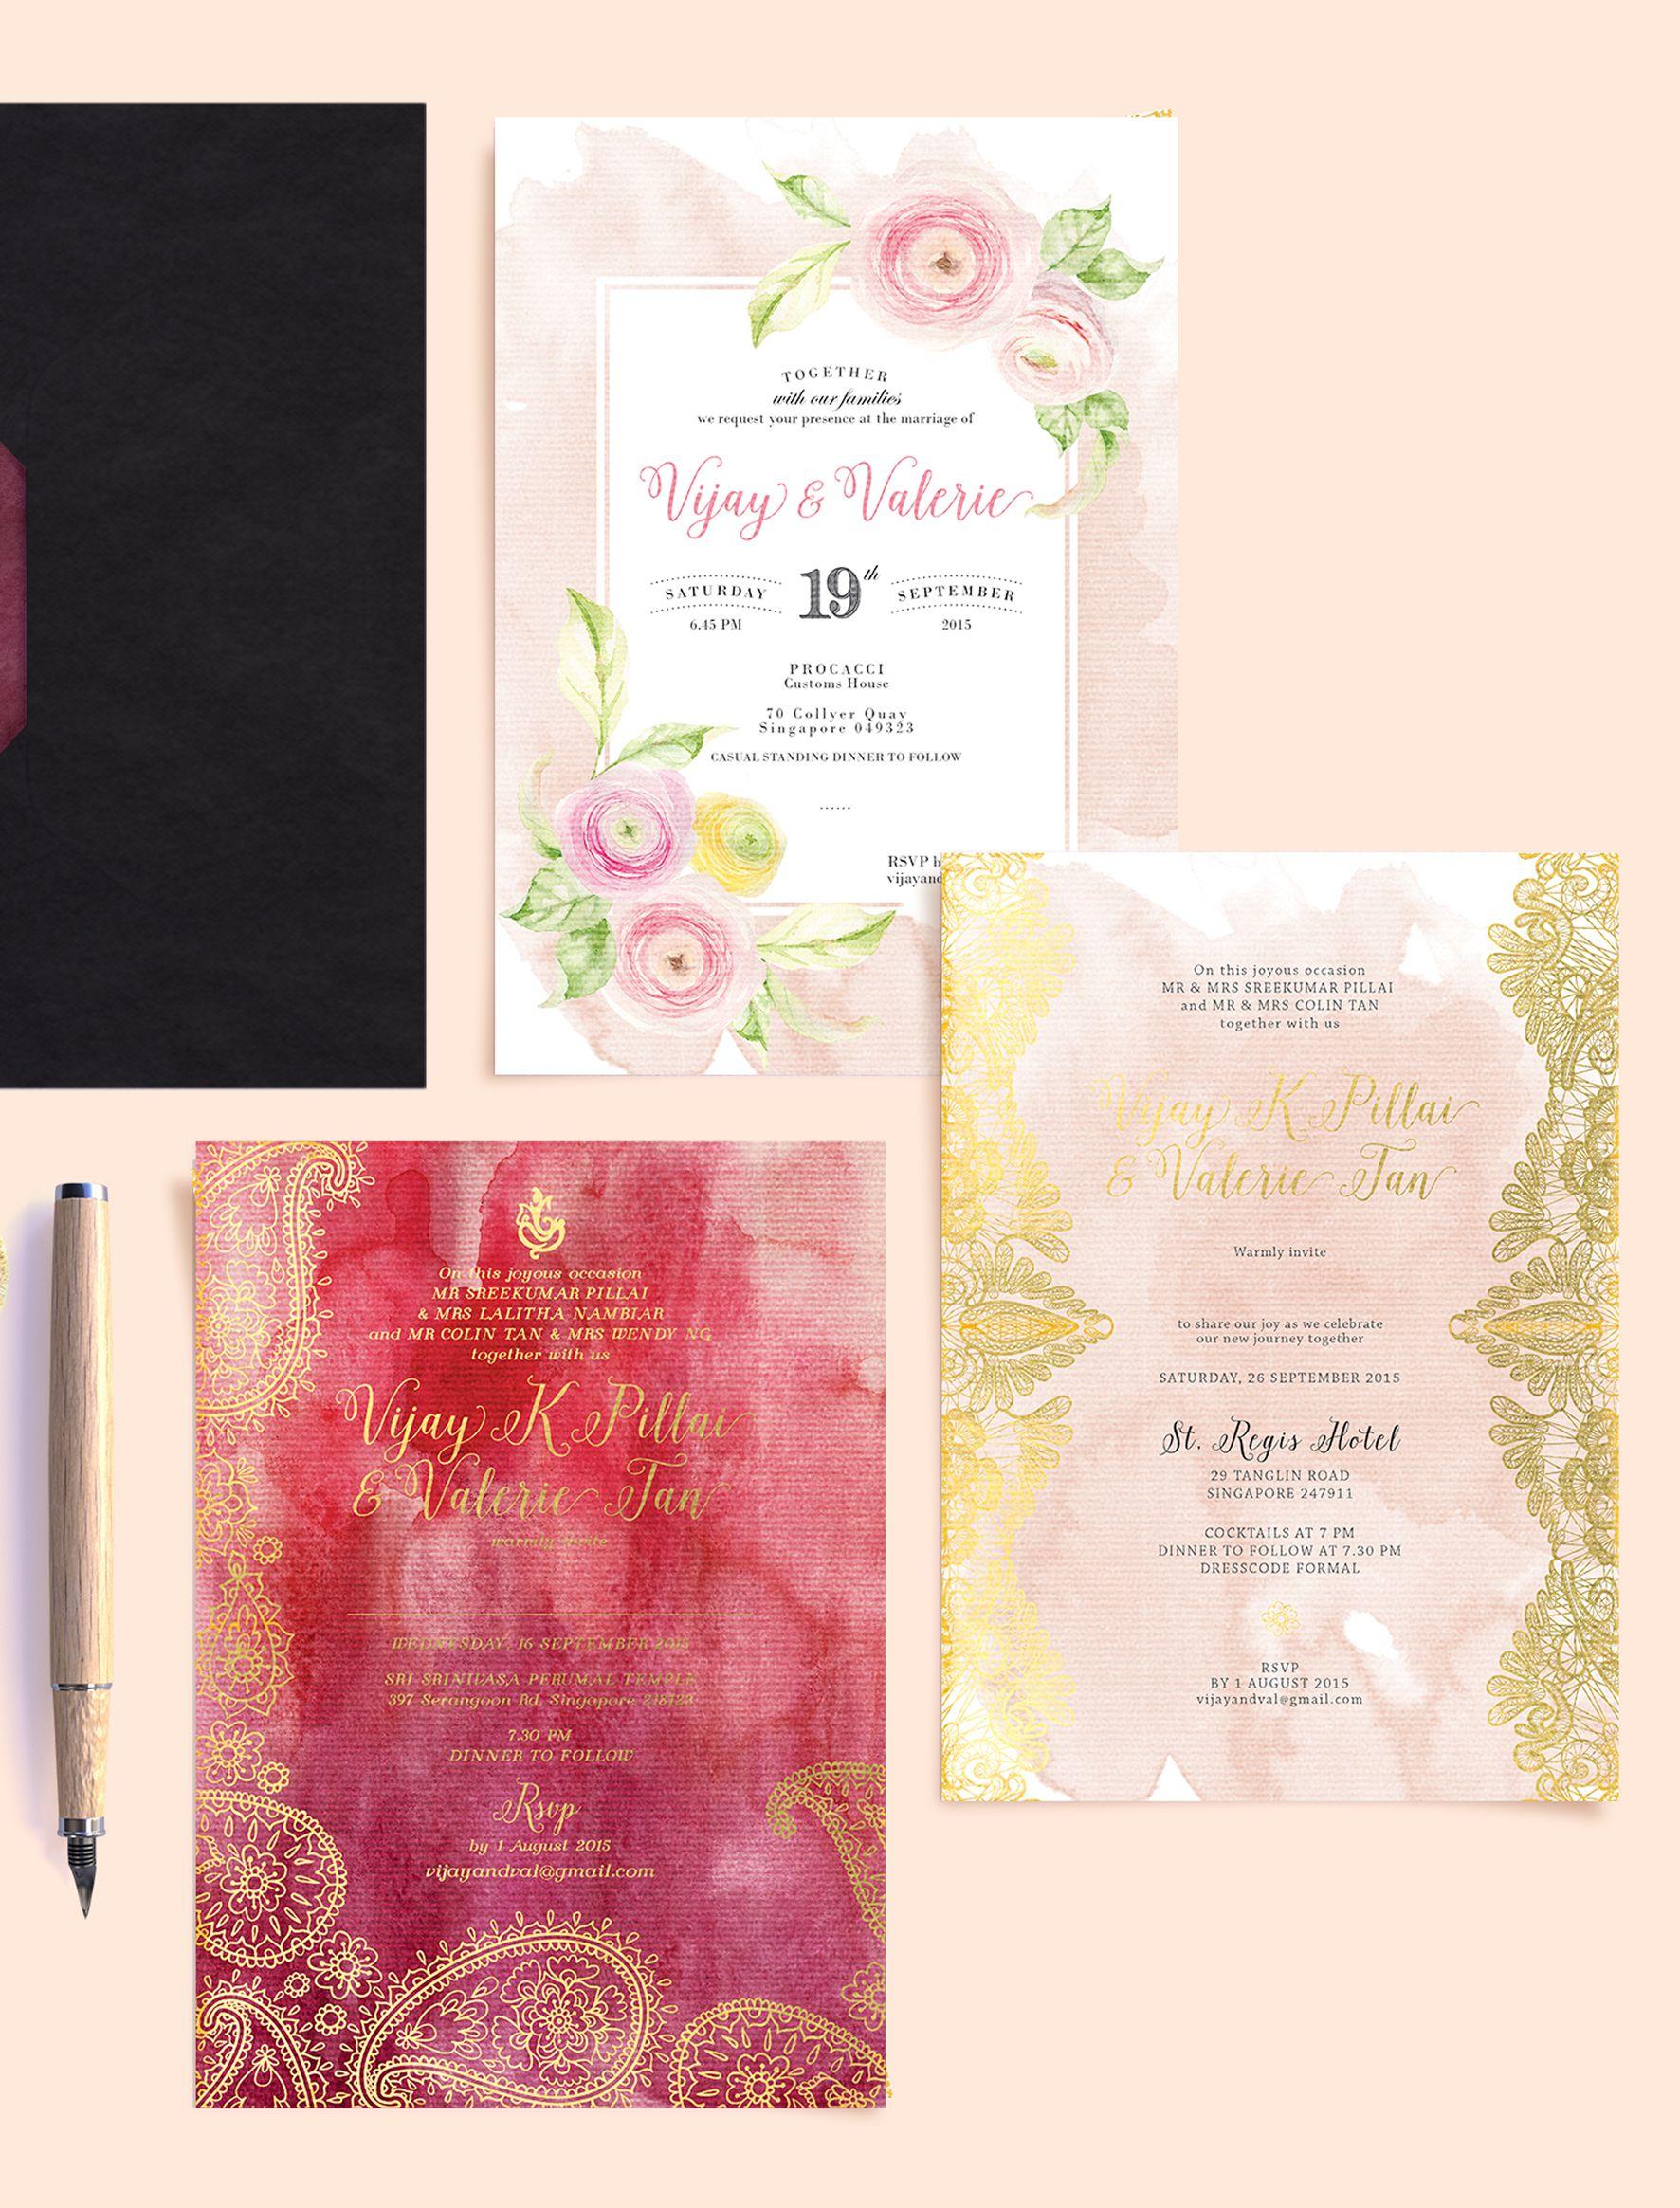 Vijay&Valerie3   Wedding Invitations   Pinterest   Elegant couple ...